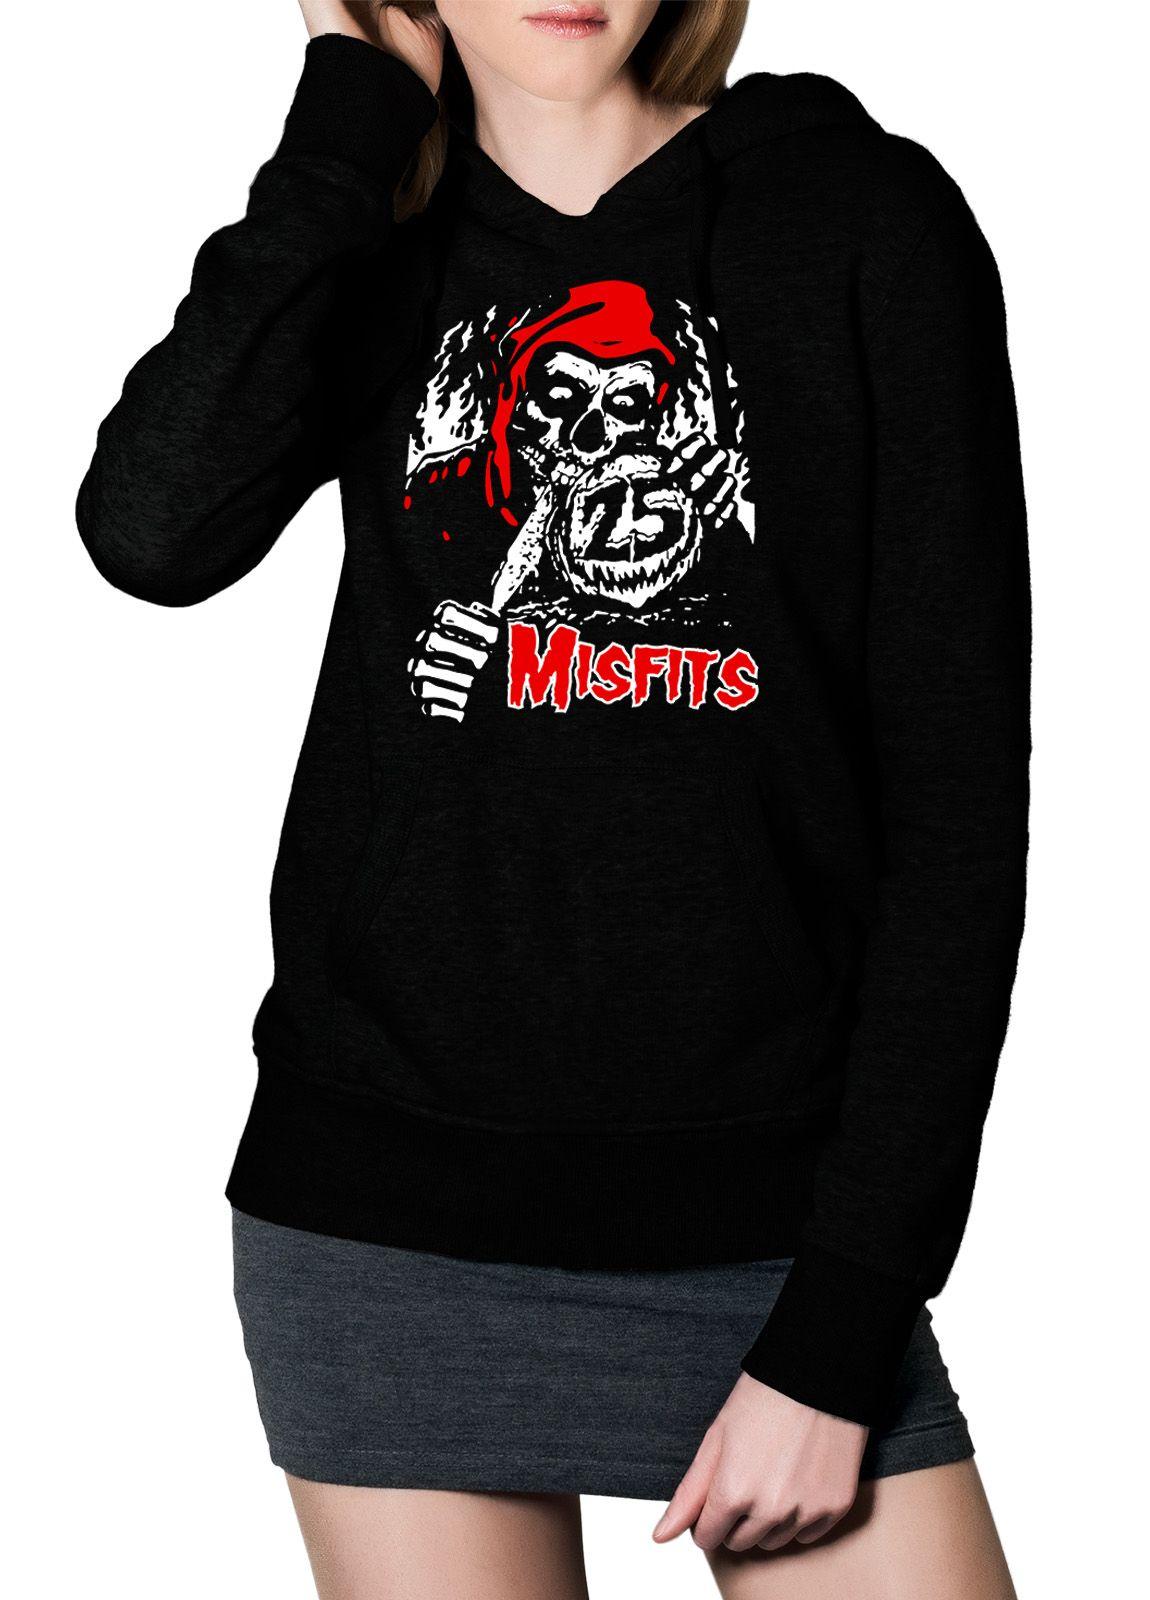 Moletom Misfits 25 Years - 006  - HShop